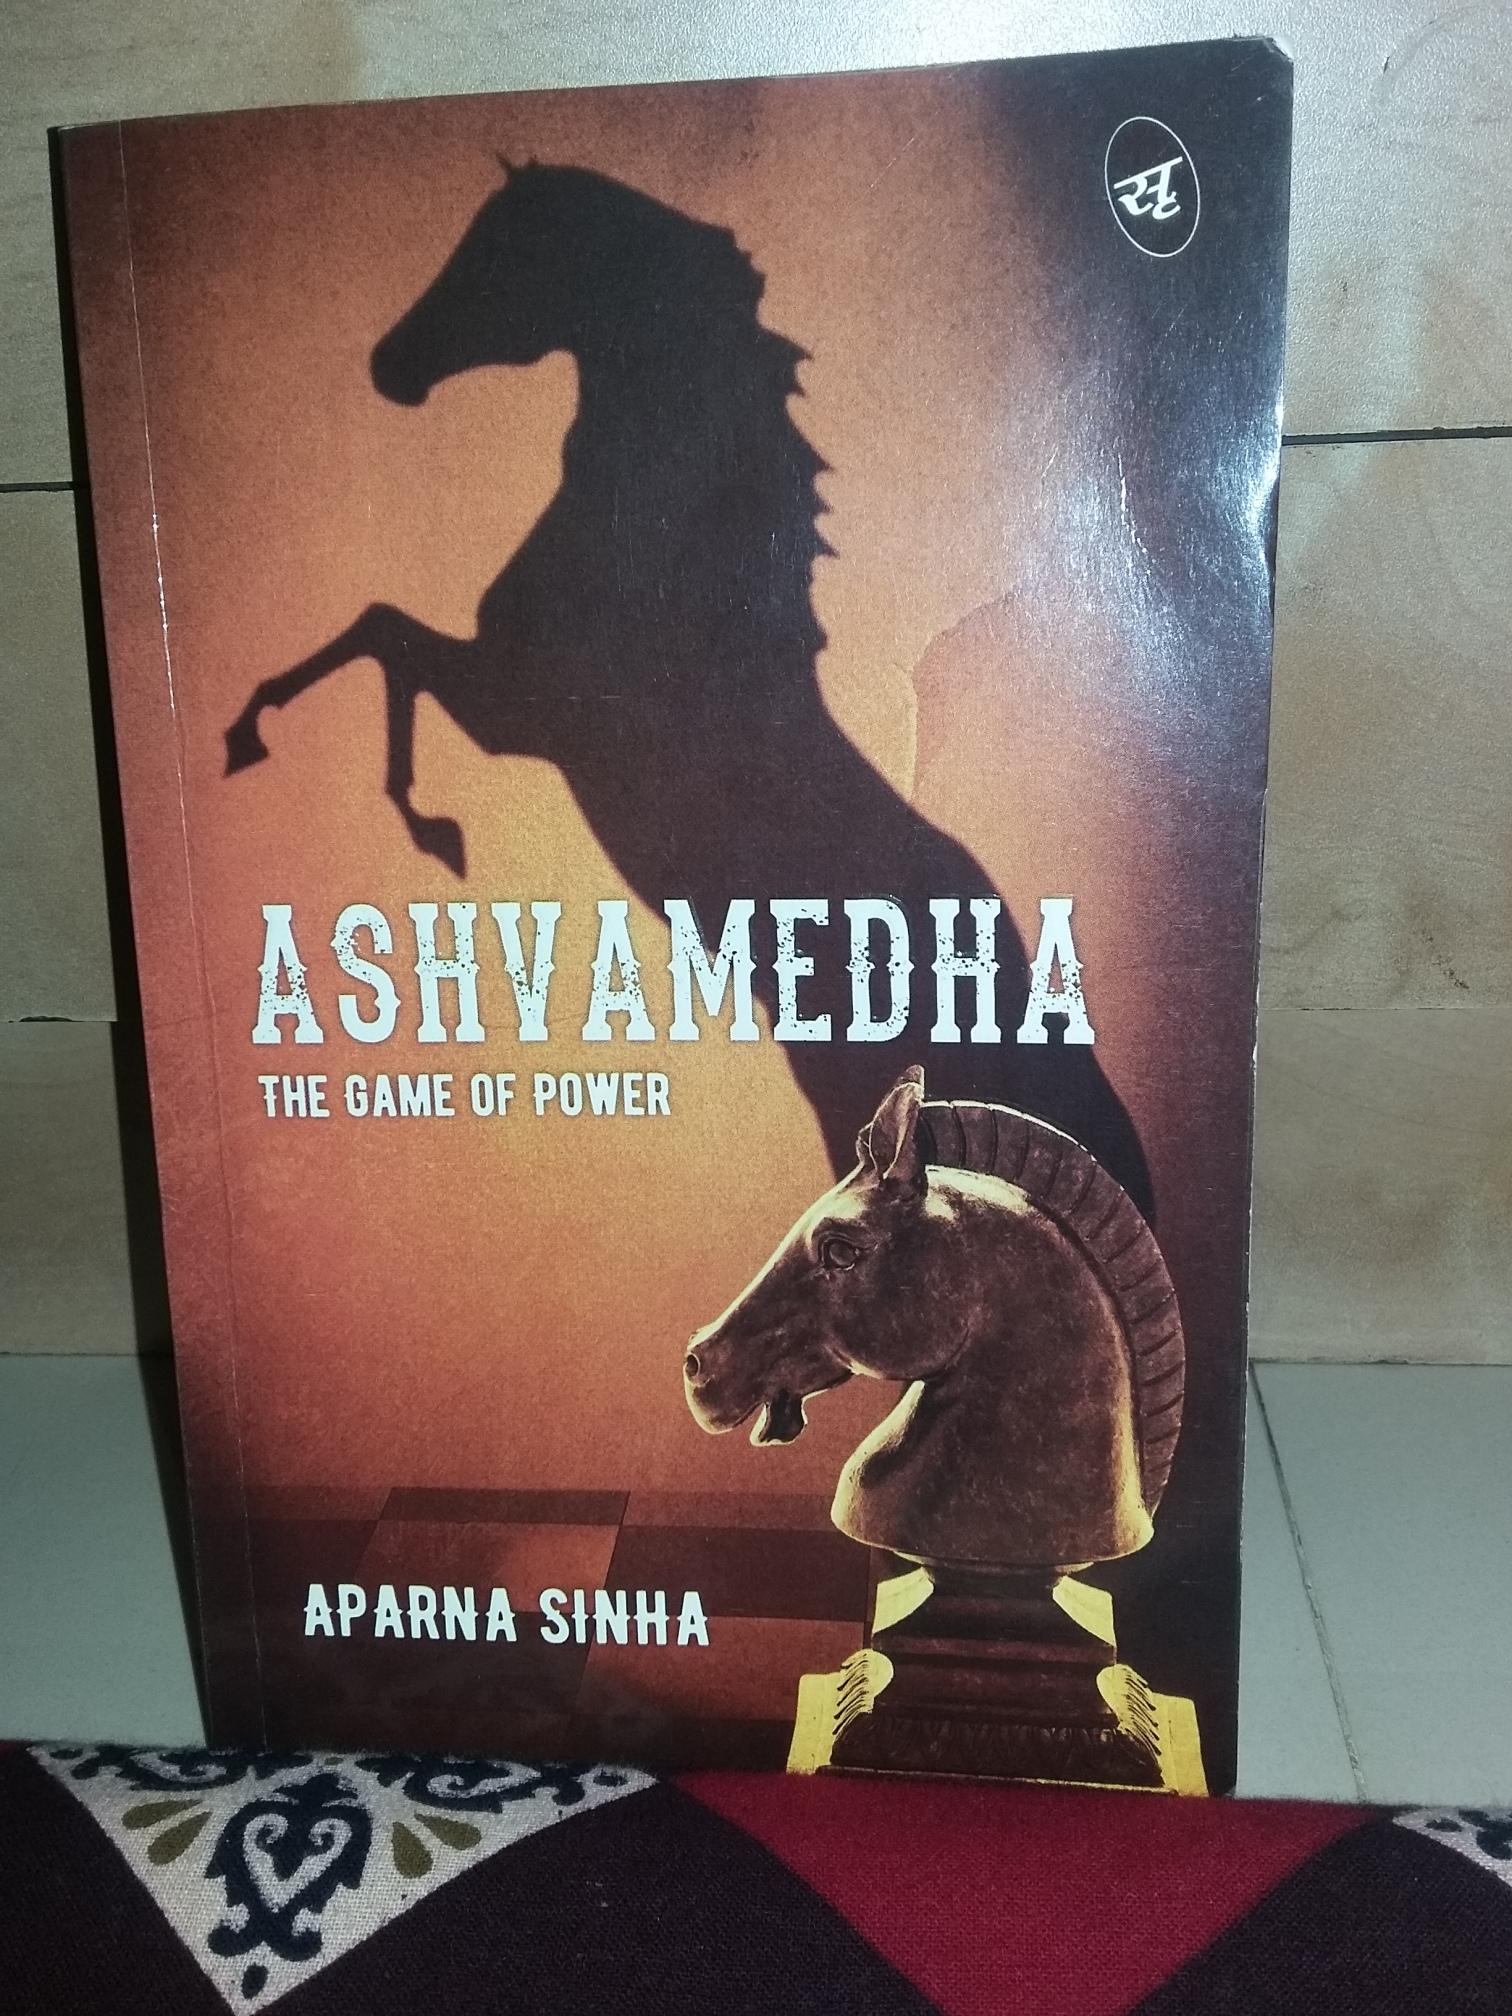 Ashvamedha: The Game of Power by Aparna Sinha